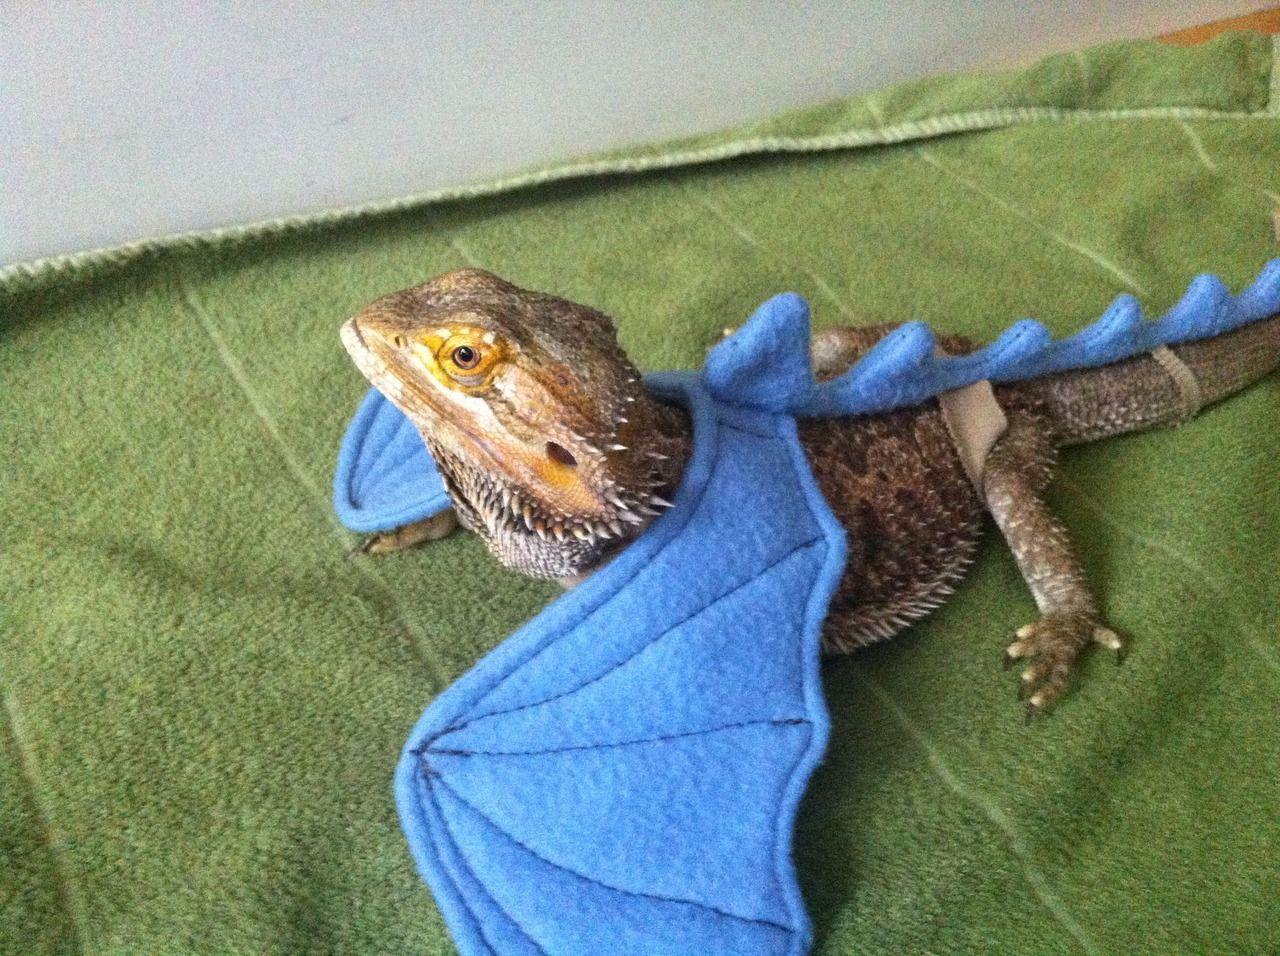 Diane Duane, lizardsenjoyinglife: this bearded dragon enjoys ...